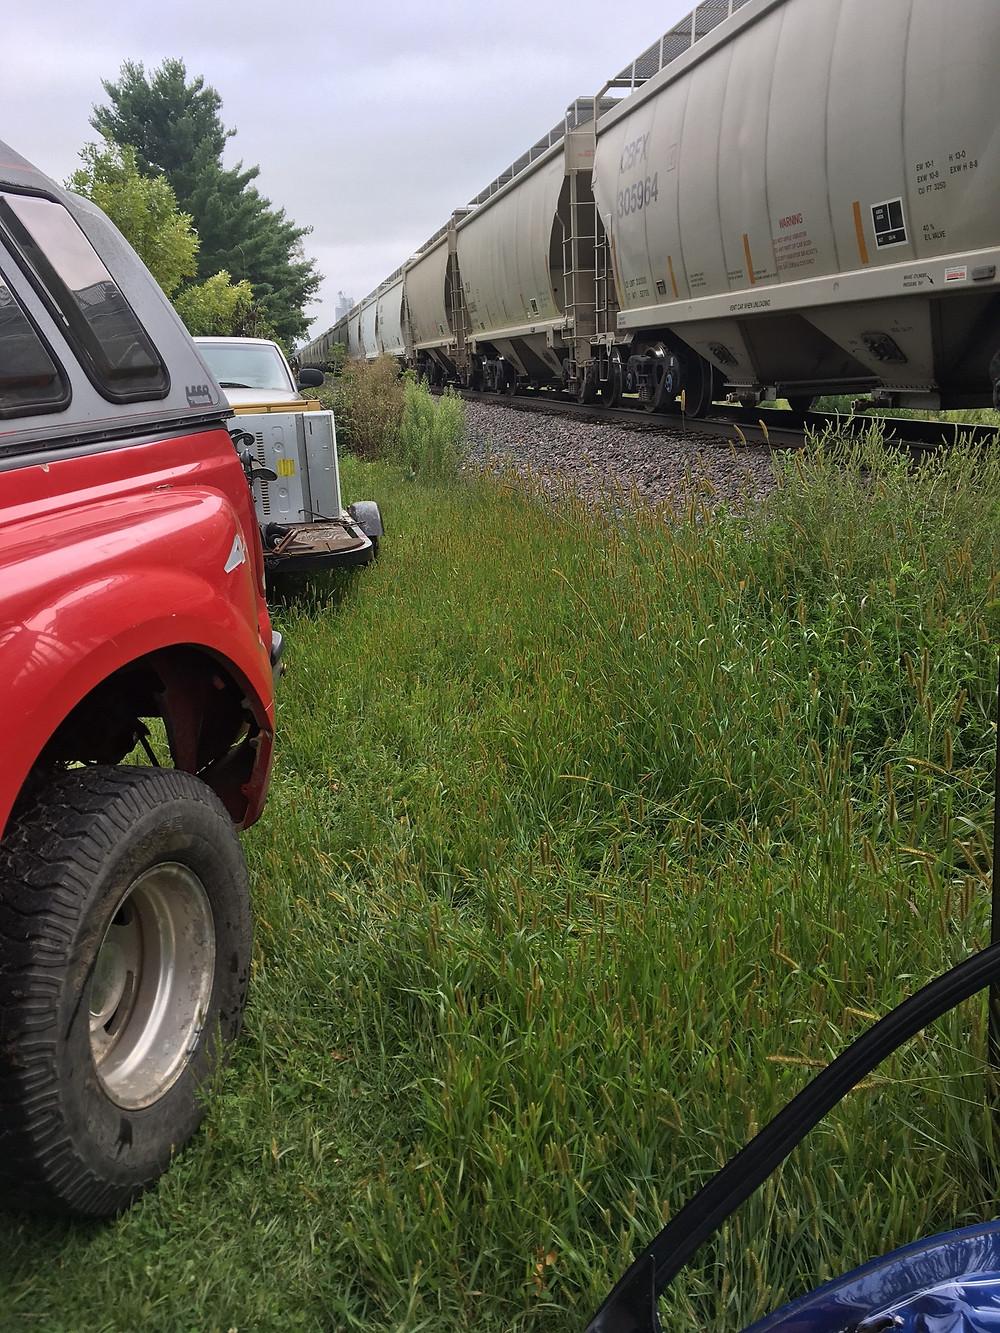 Train vs Car in Barron